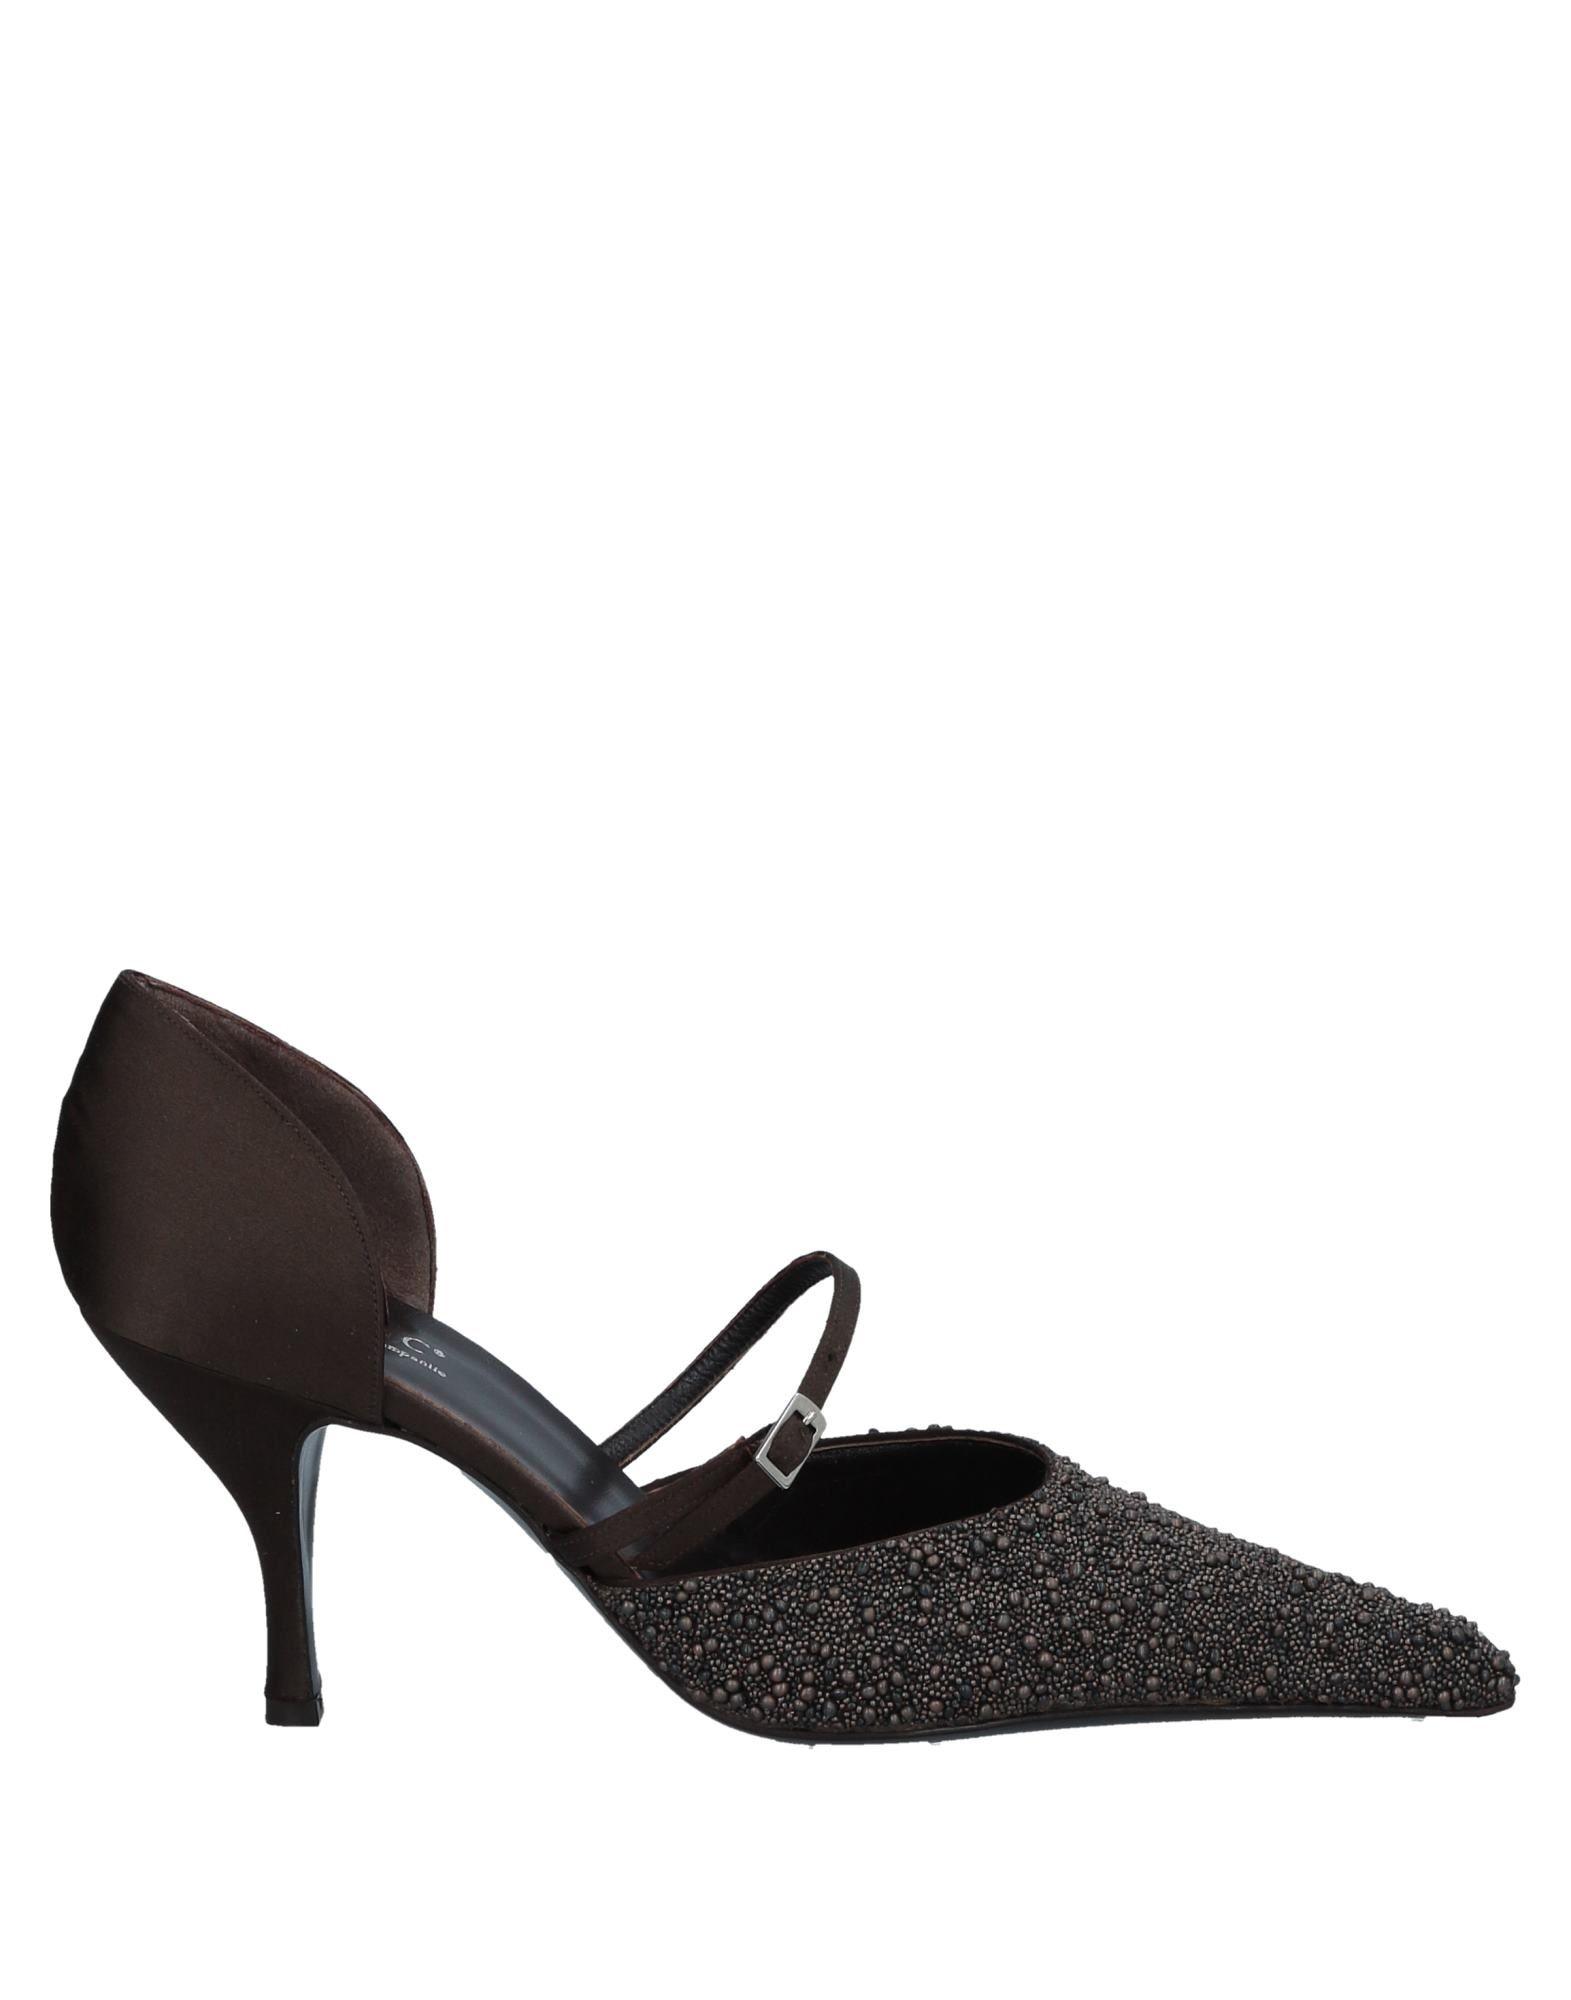 Avc By Adriana V.Campanile Pumps Damen  11532329DW Gute Qualität beliebte Schuhe